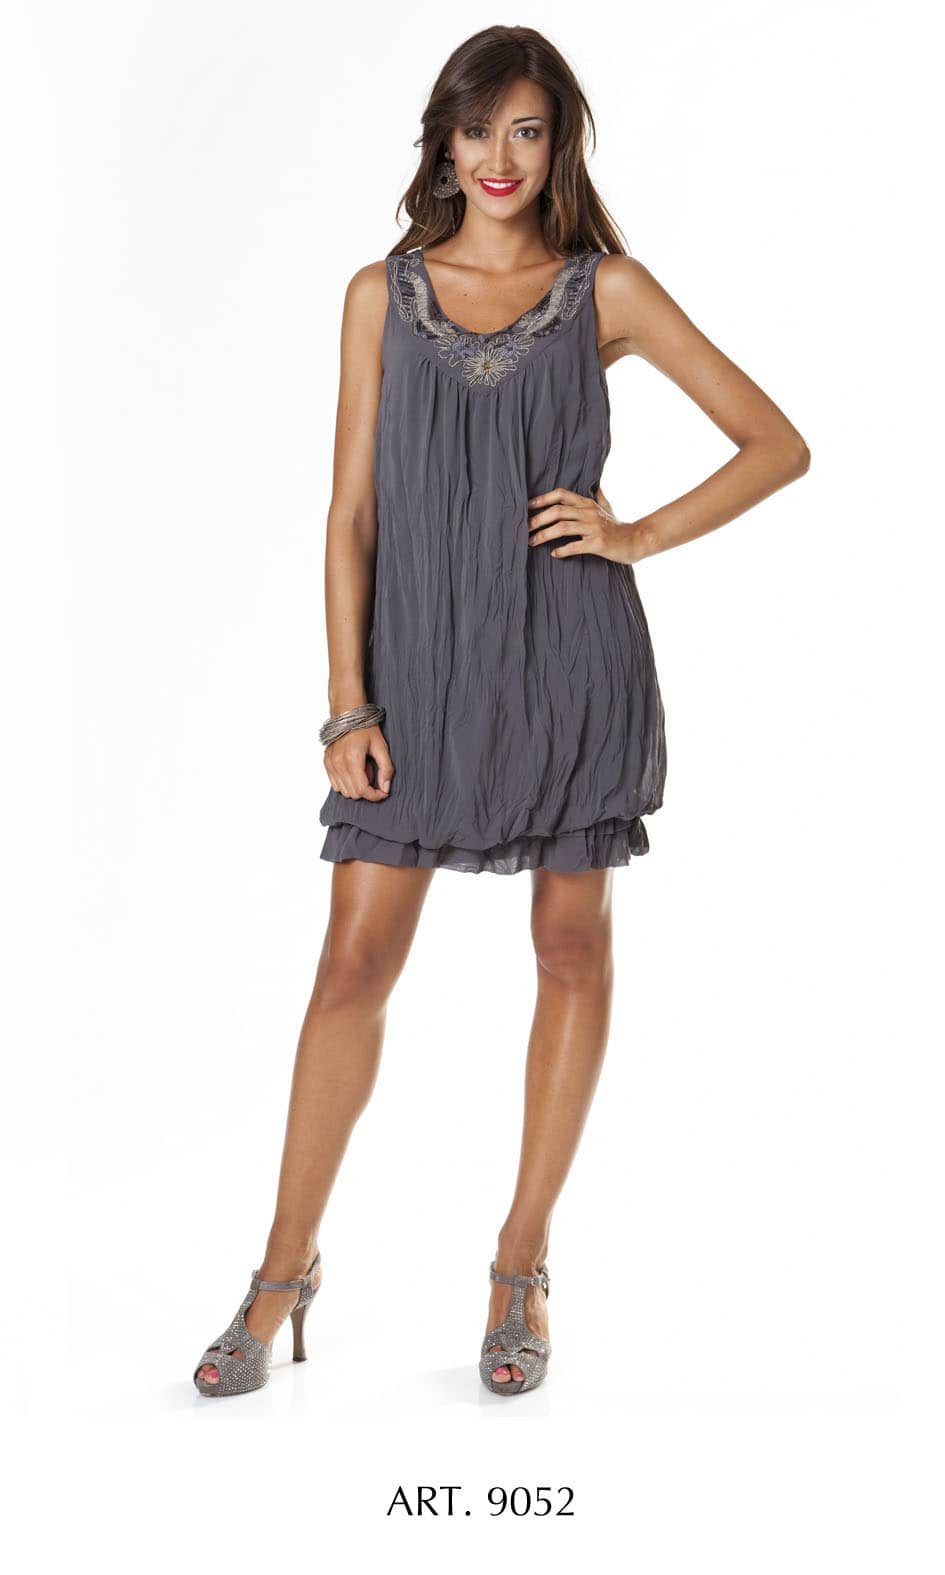 italy-women 20clothing-women 20attire- jpgItalian Women Clothing